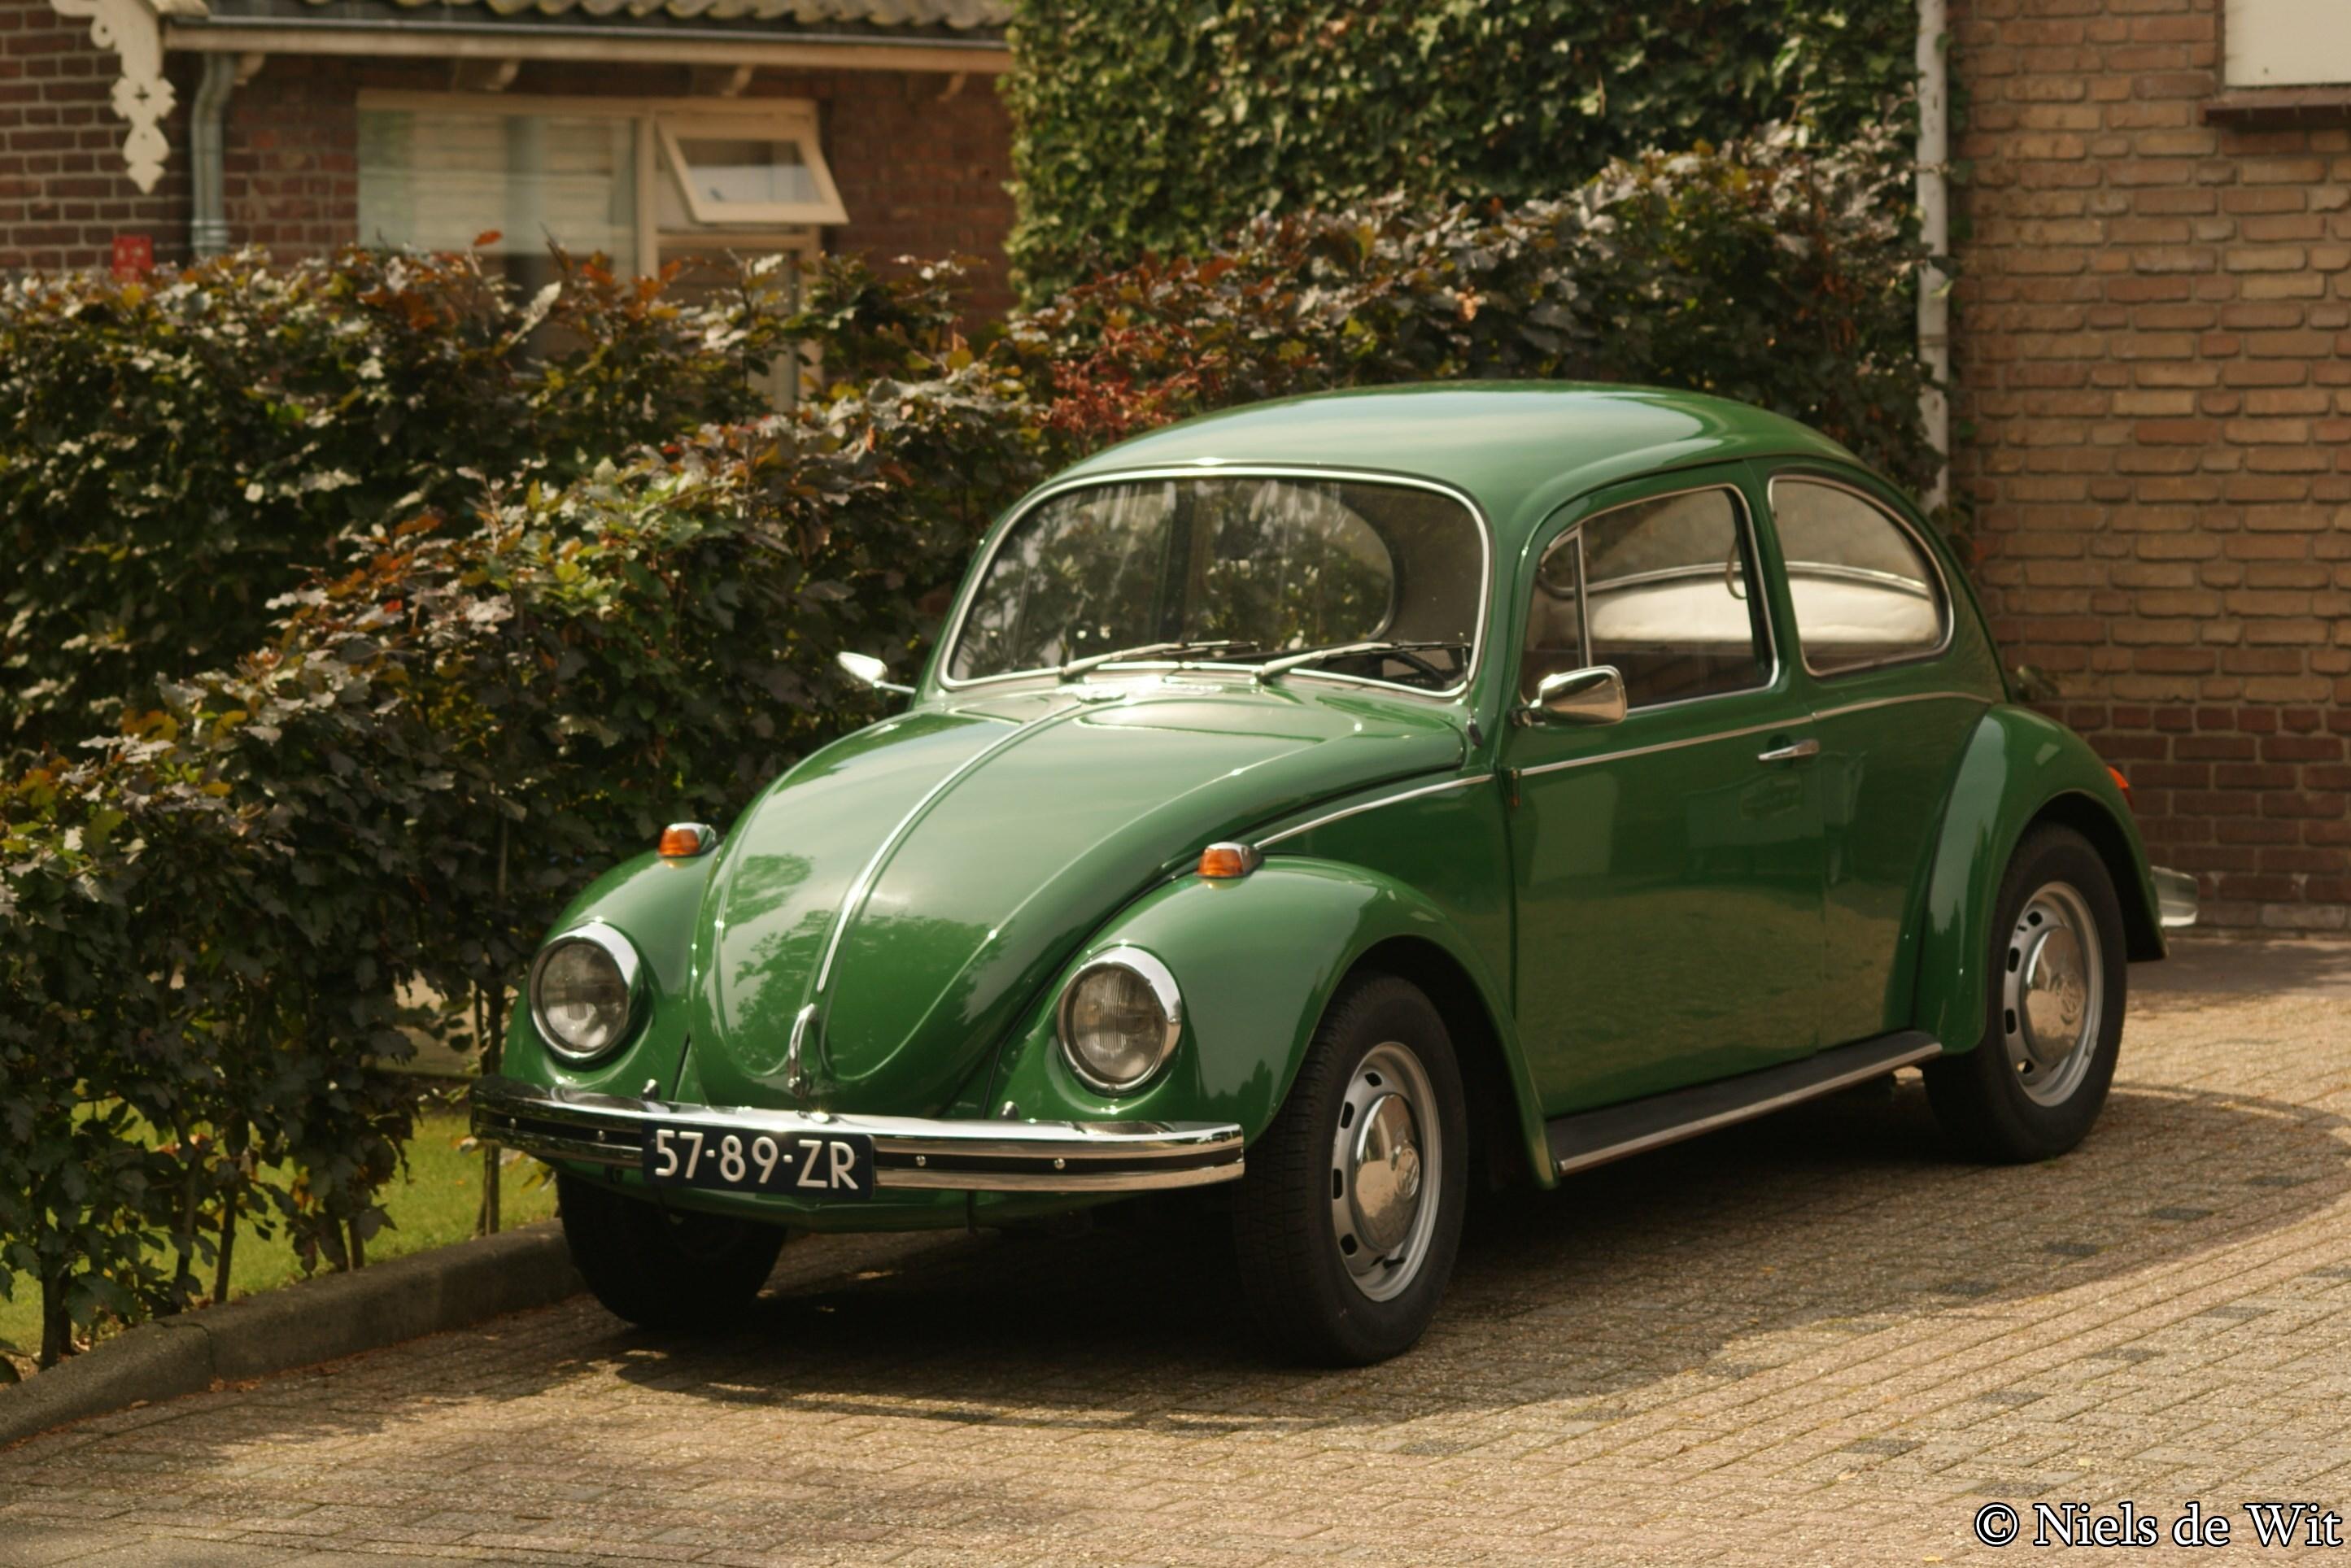 file:1970 volkswagen beetle (14766513991) - wikimedia commons